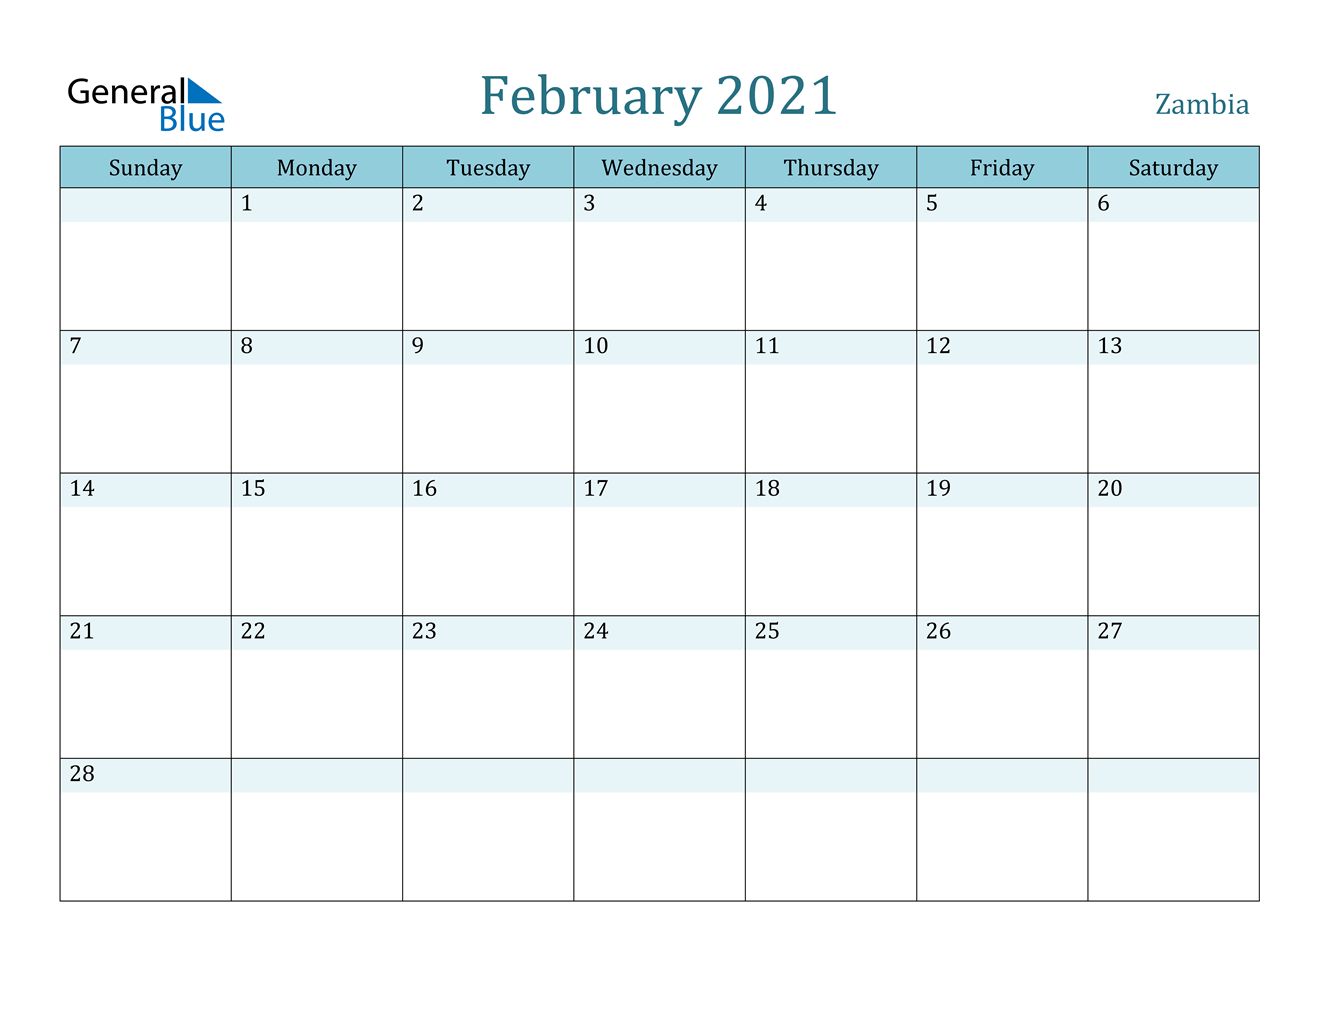 Zambia February 2021 Calendar with Holidays